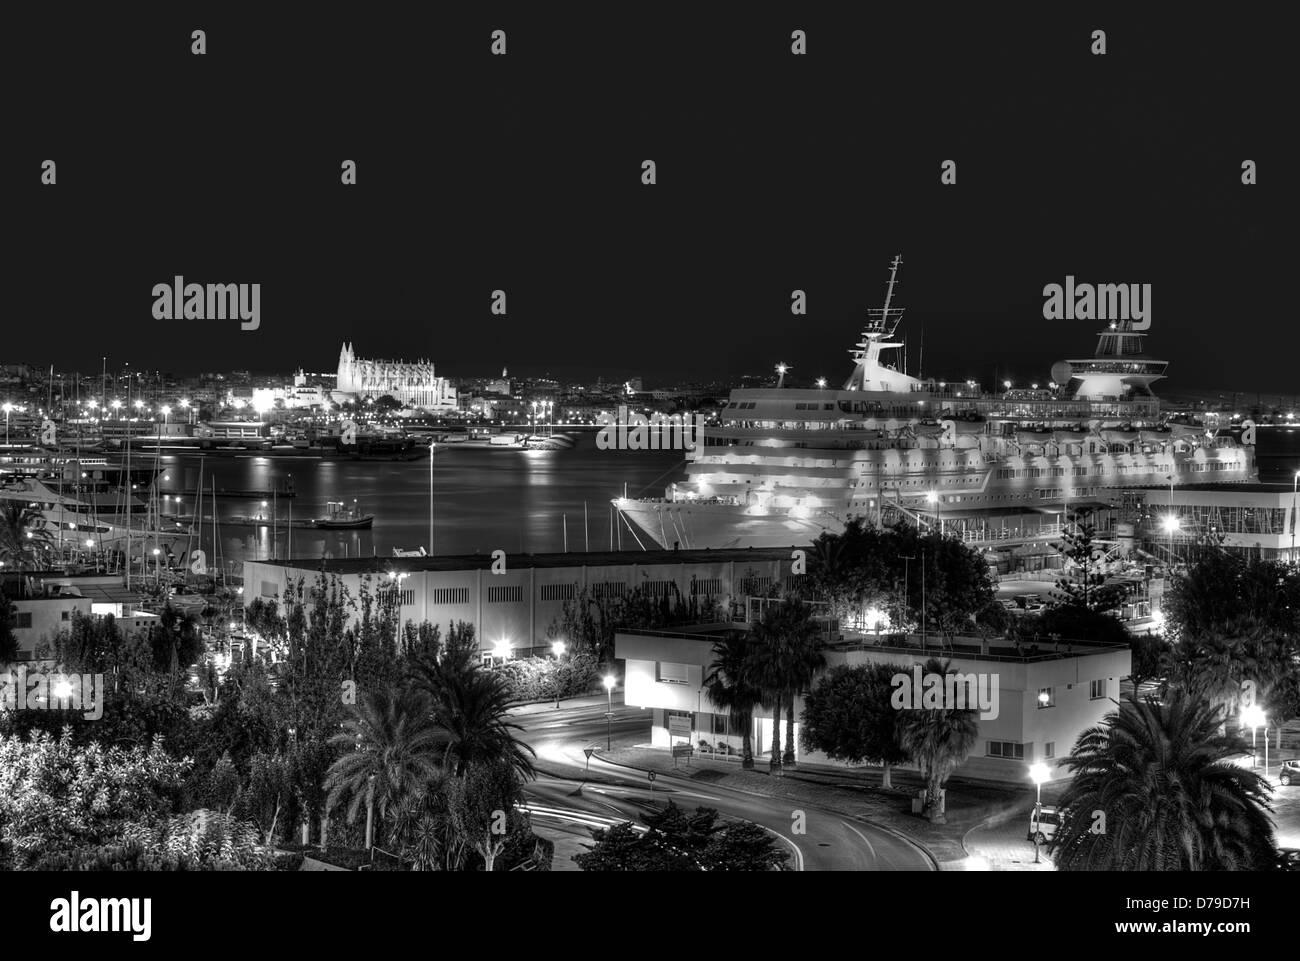 Night view of the port of Palma de Mallorca, Spain - Stock Image